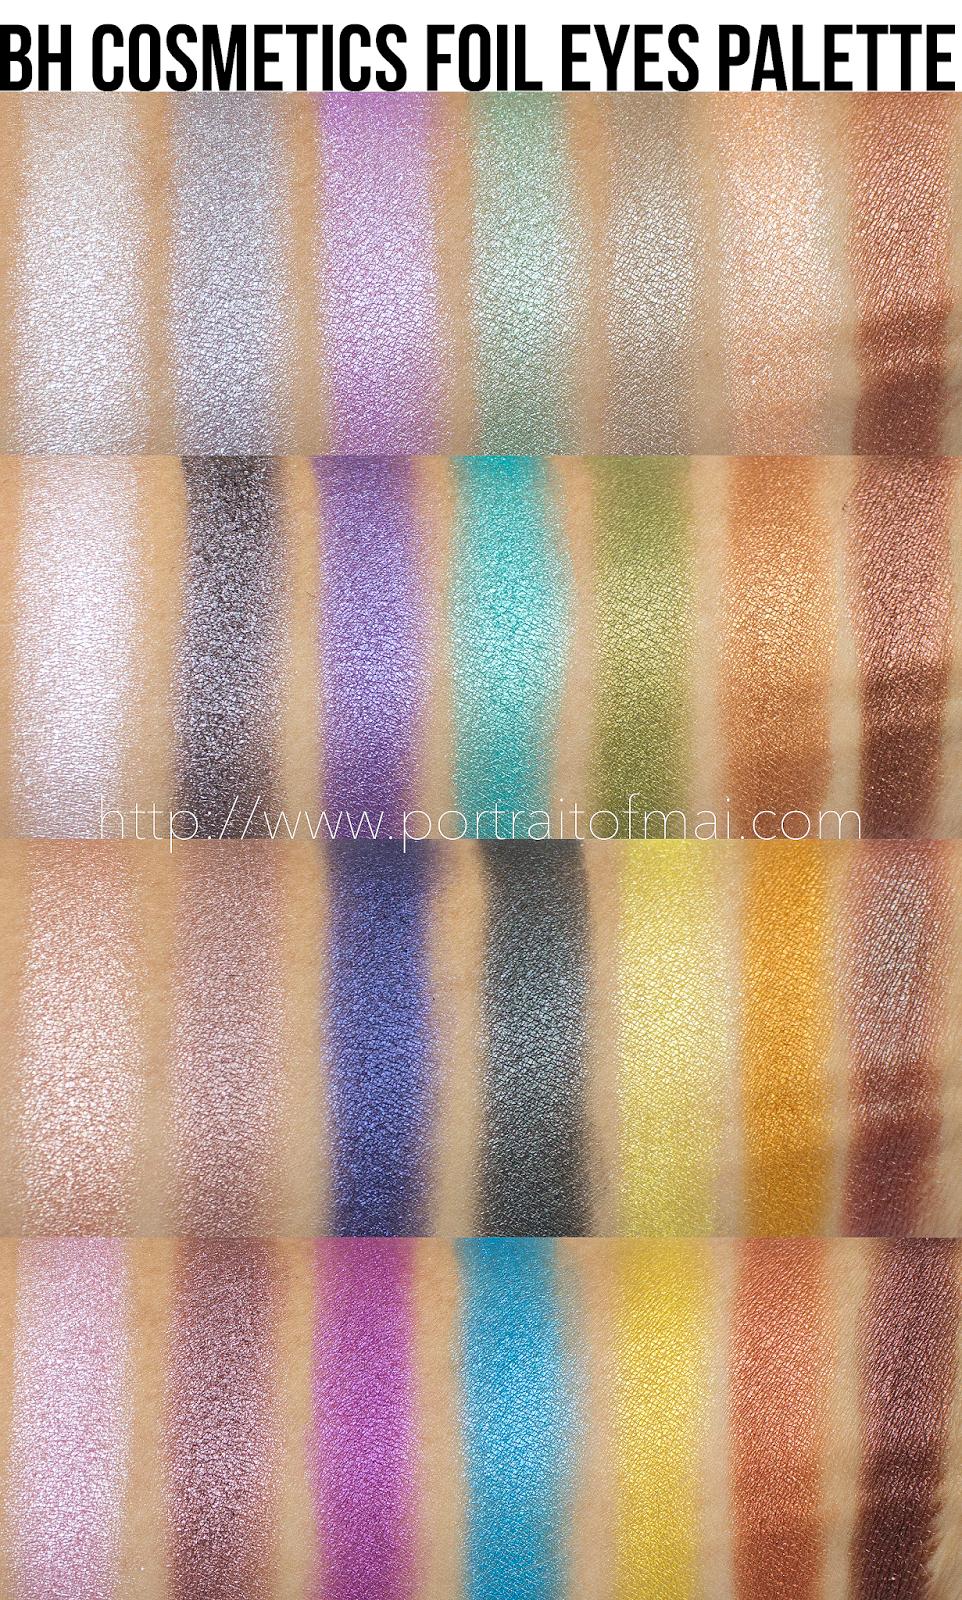 e8c5bebcb9b BH Cosmetics Foil Eyes Palette - An inexpensive alternative to the Makeup  Geek Foiled Eyeshadows.